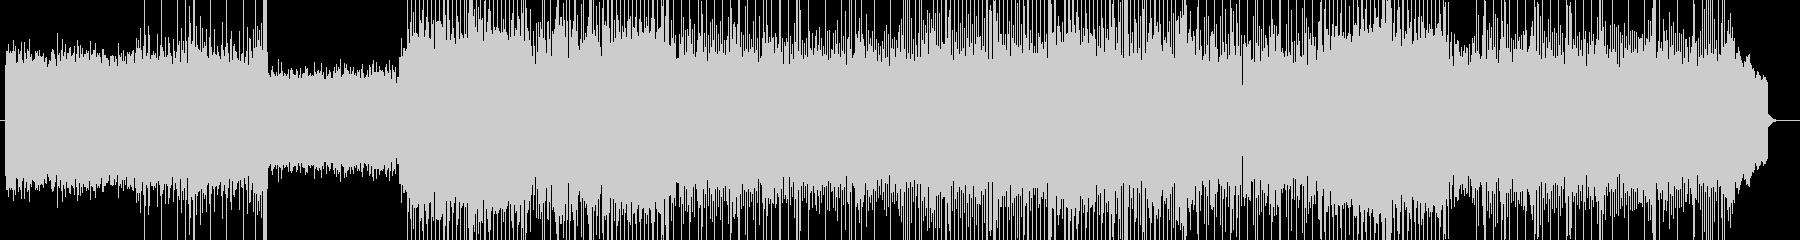 「HR/HM」「DARK」BGM125の未再生の波形